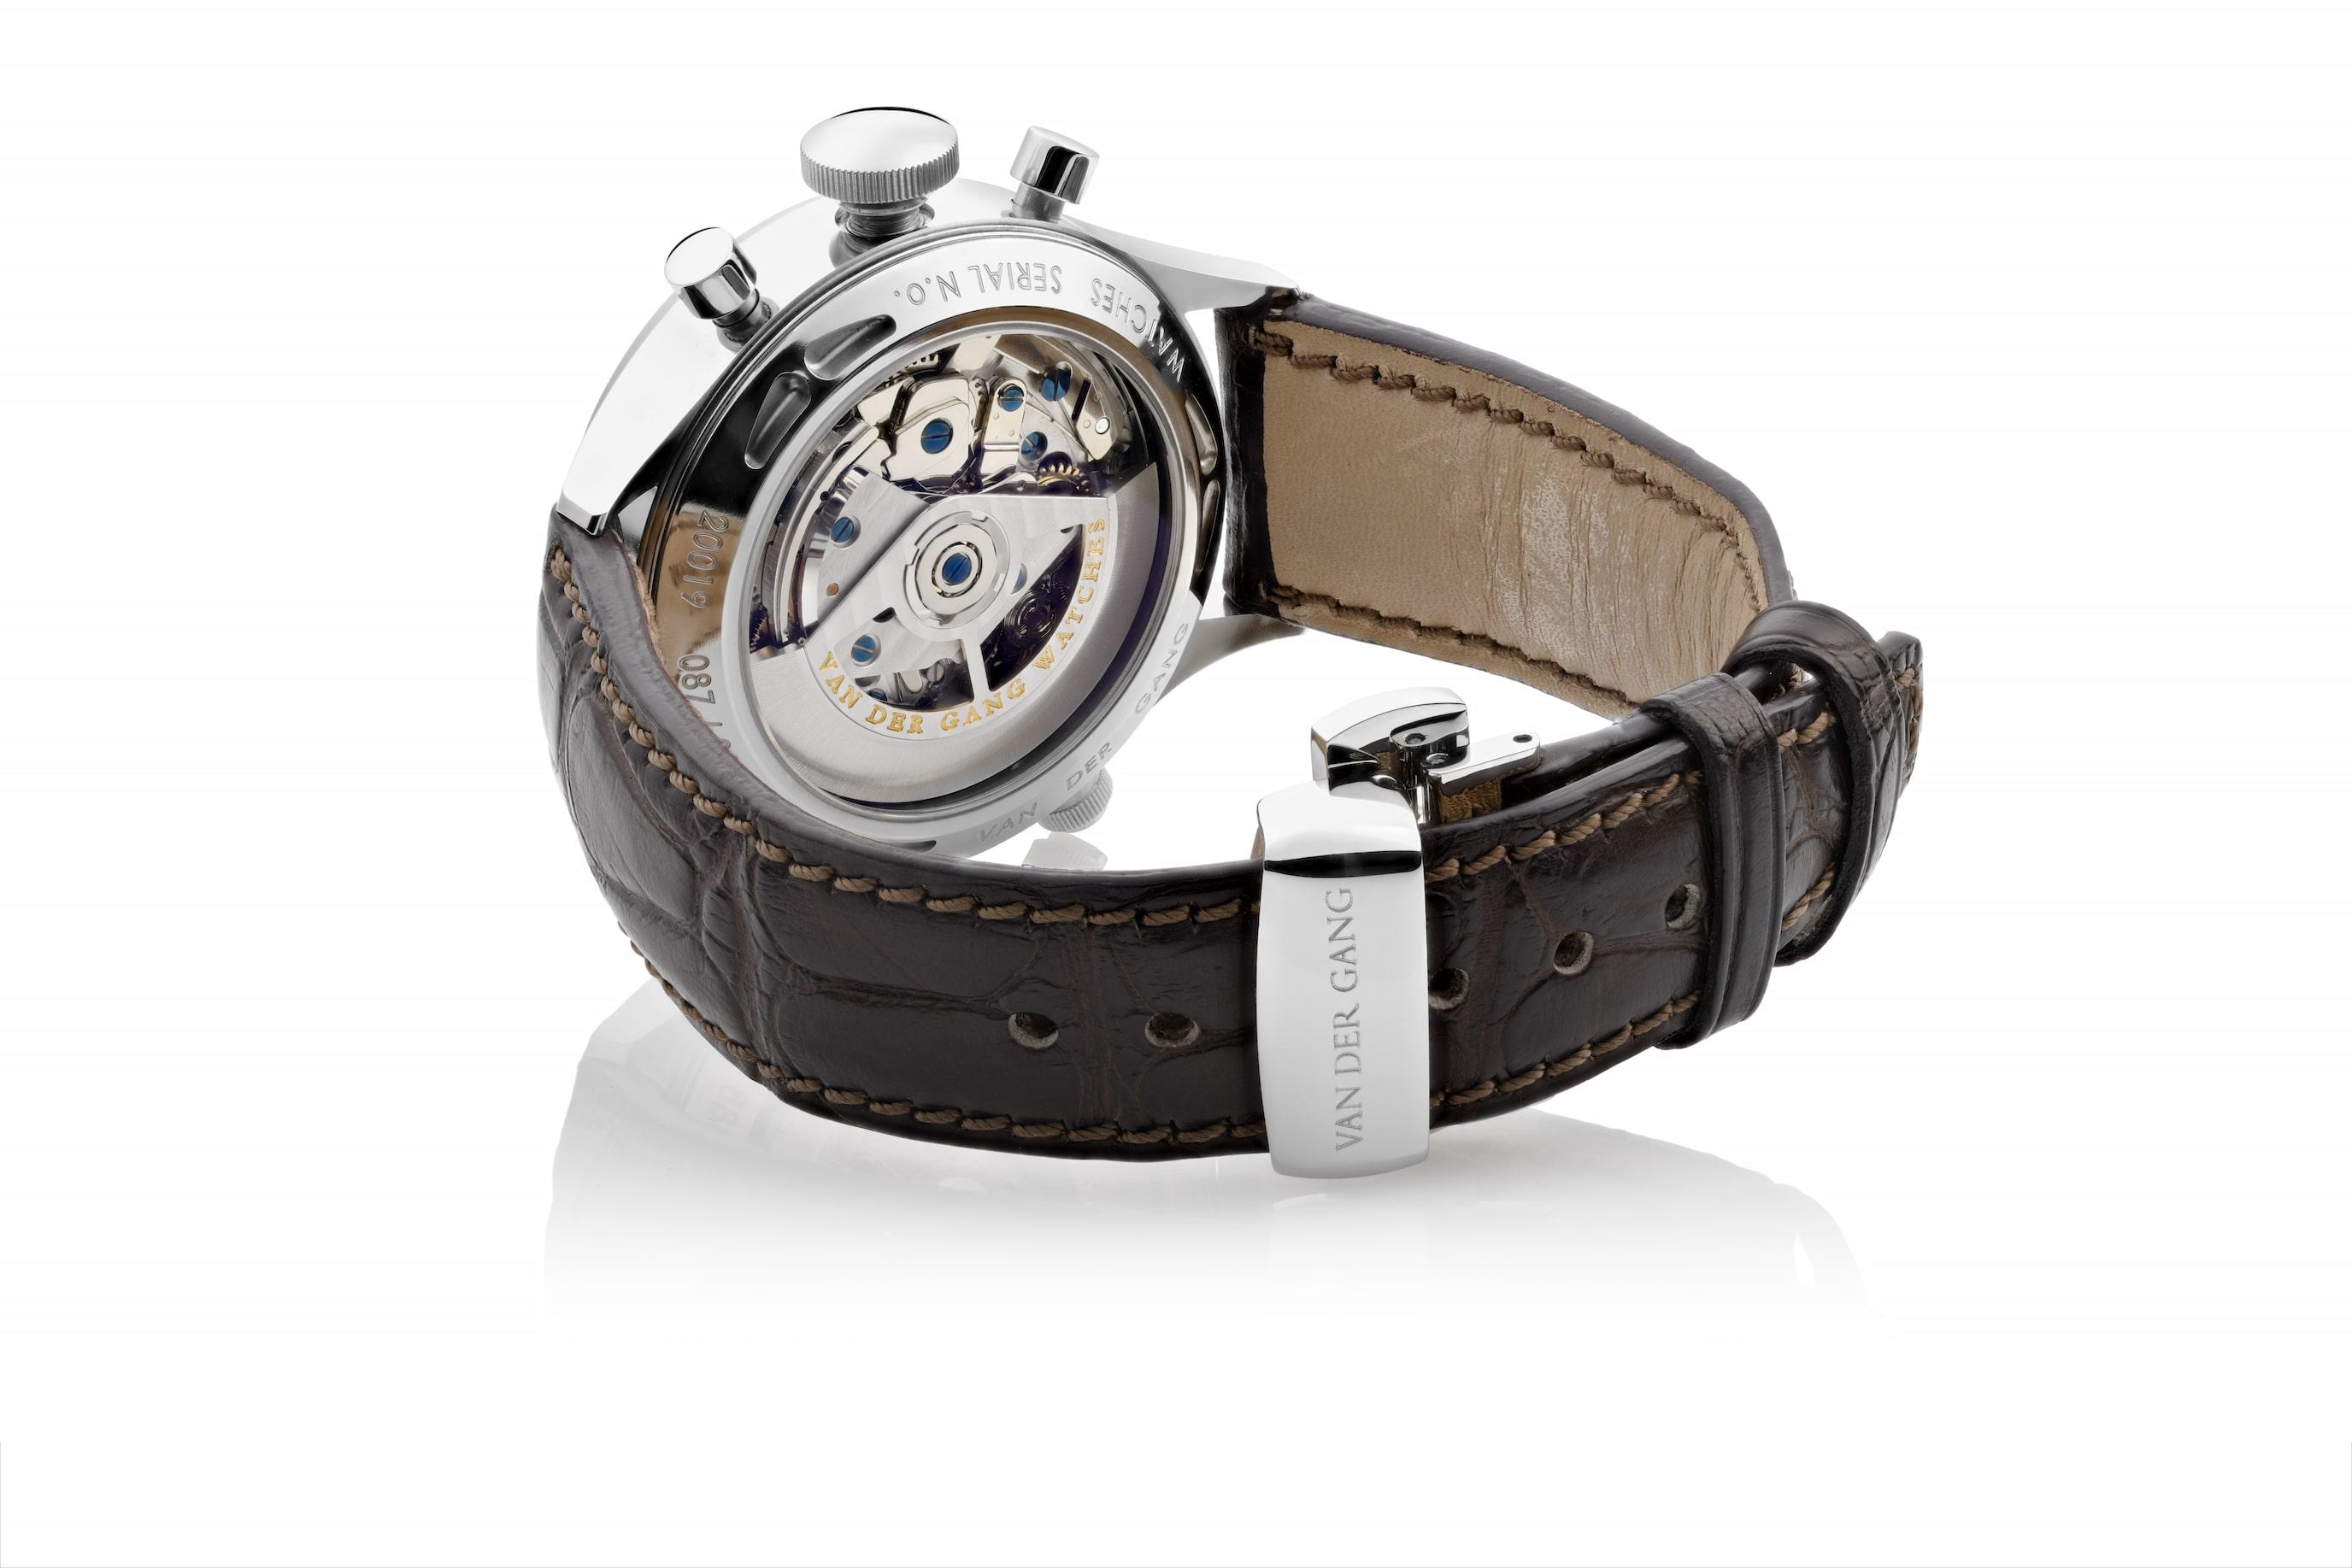 Nederlands horlogemerk Van Der Gang